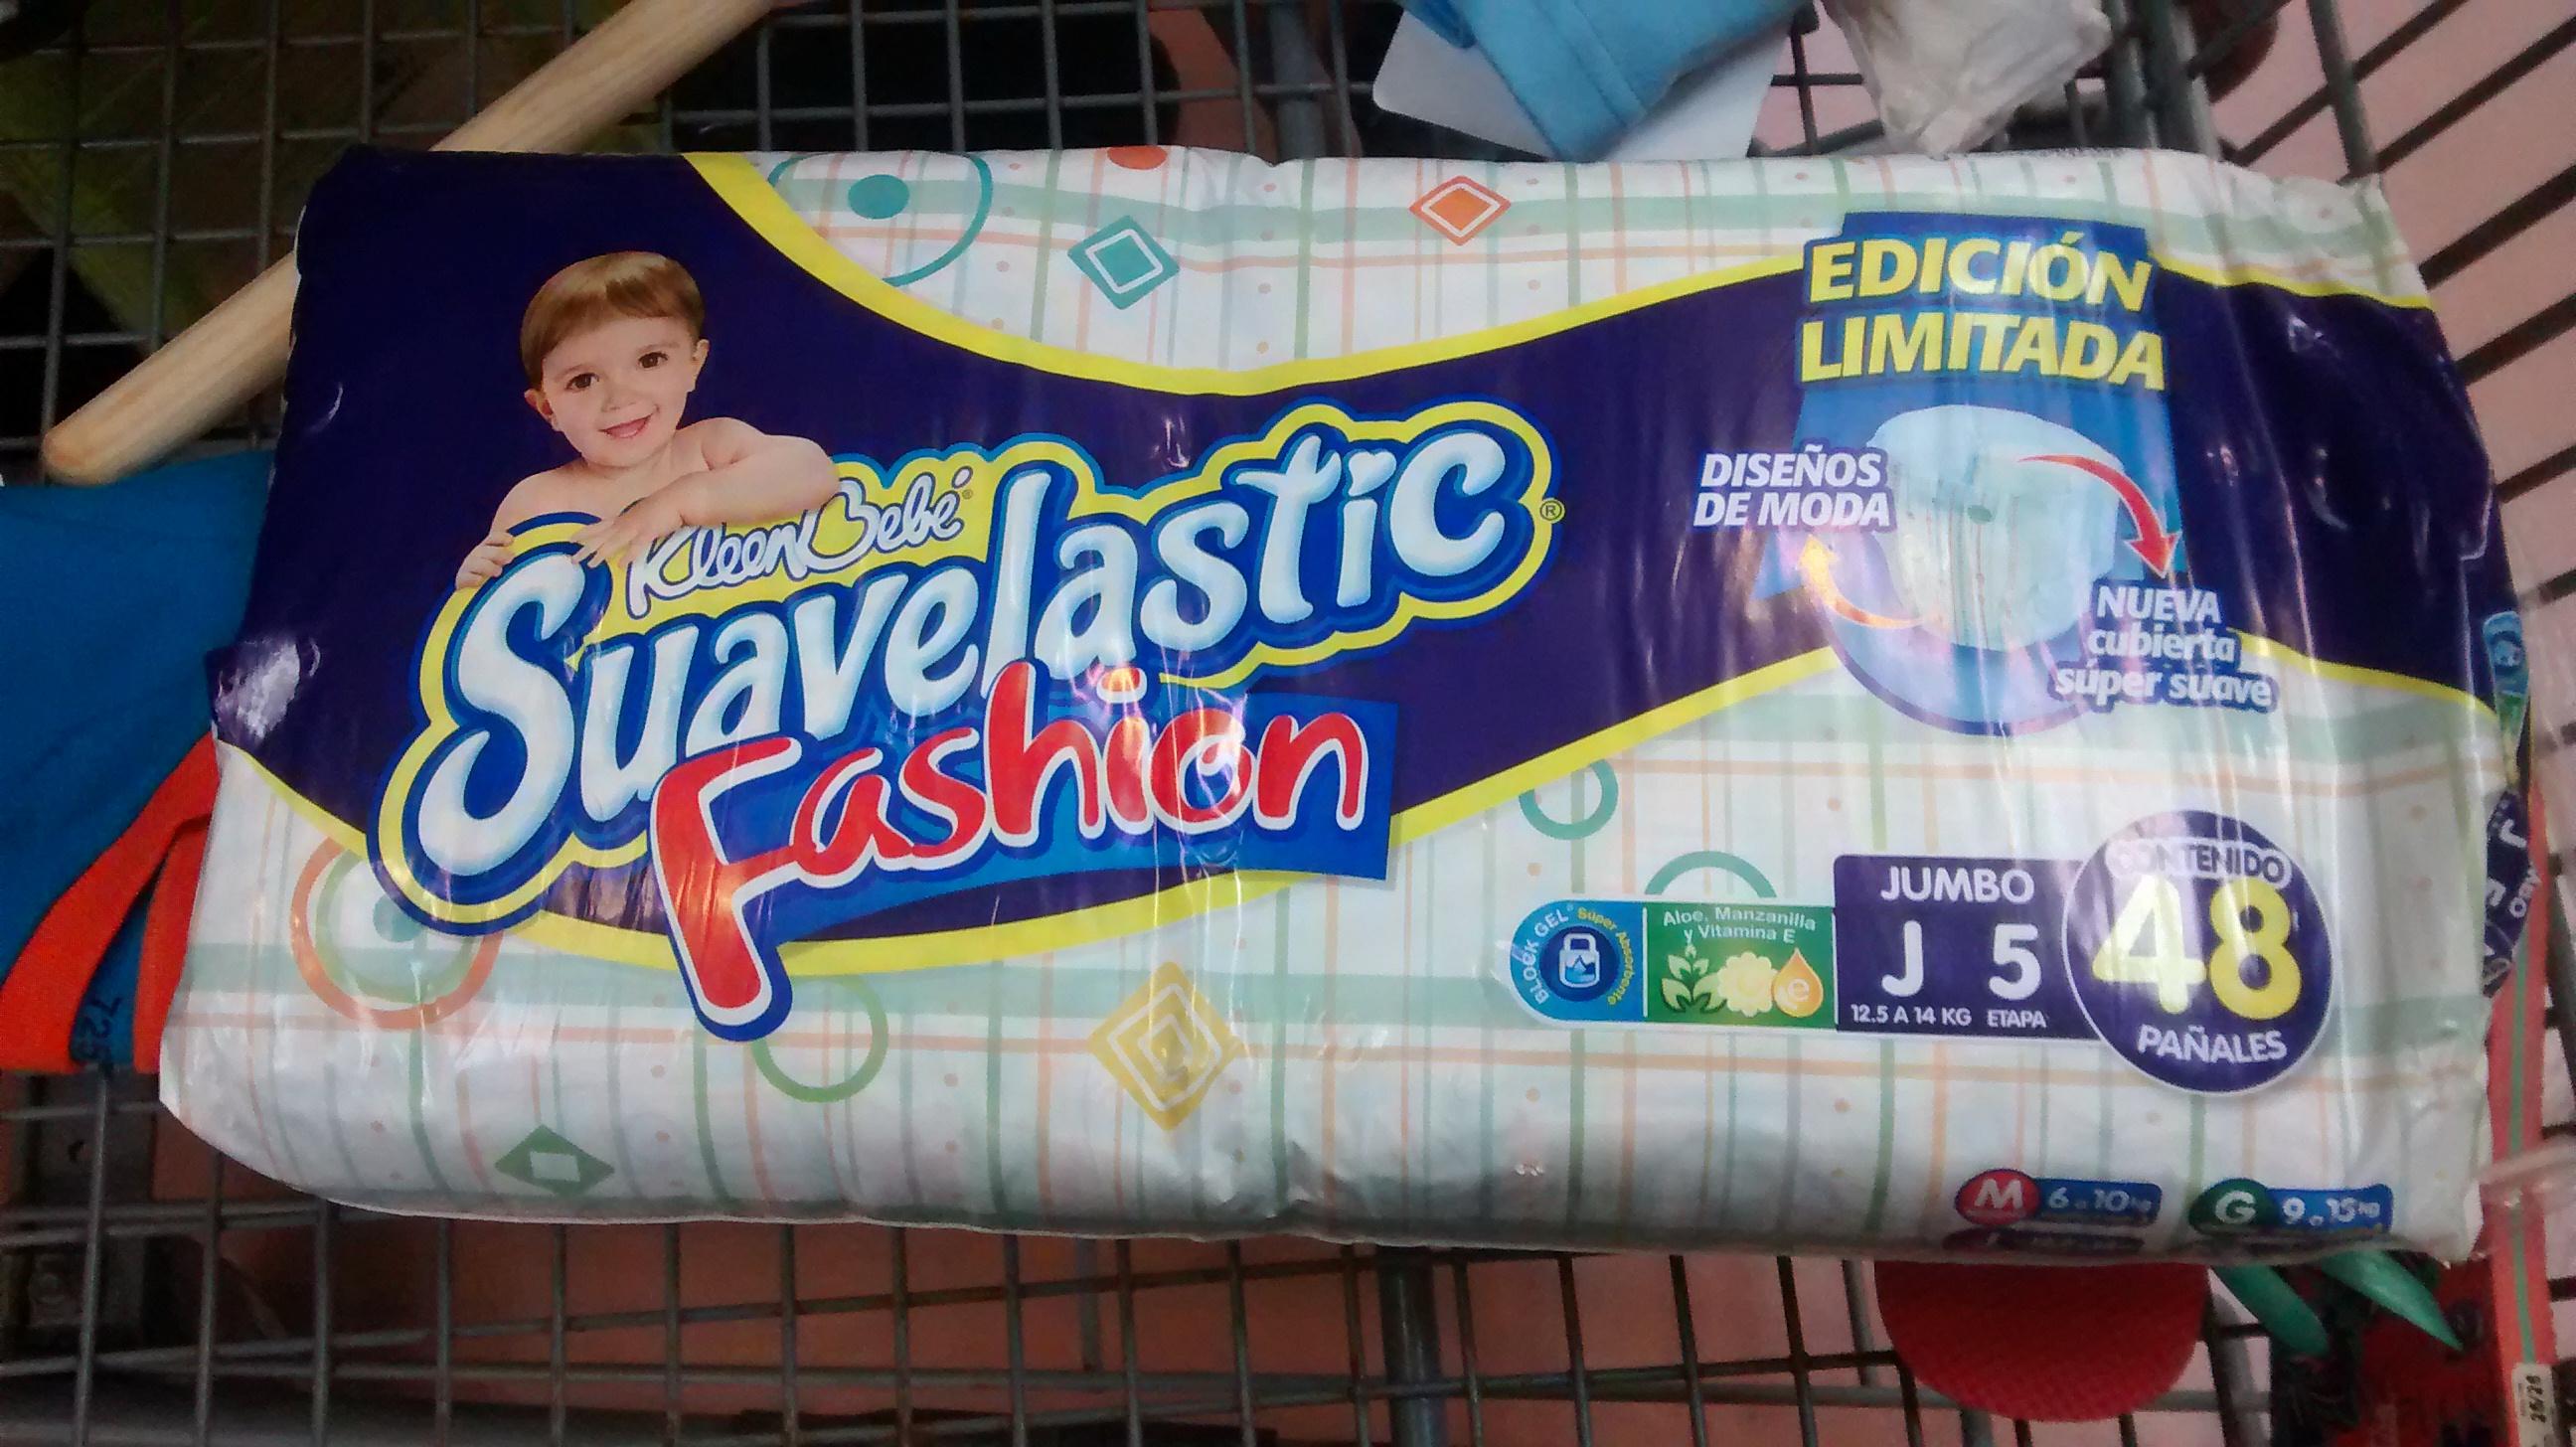 Walmart: pañales suavelastic fashion talla 5 $80.03